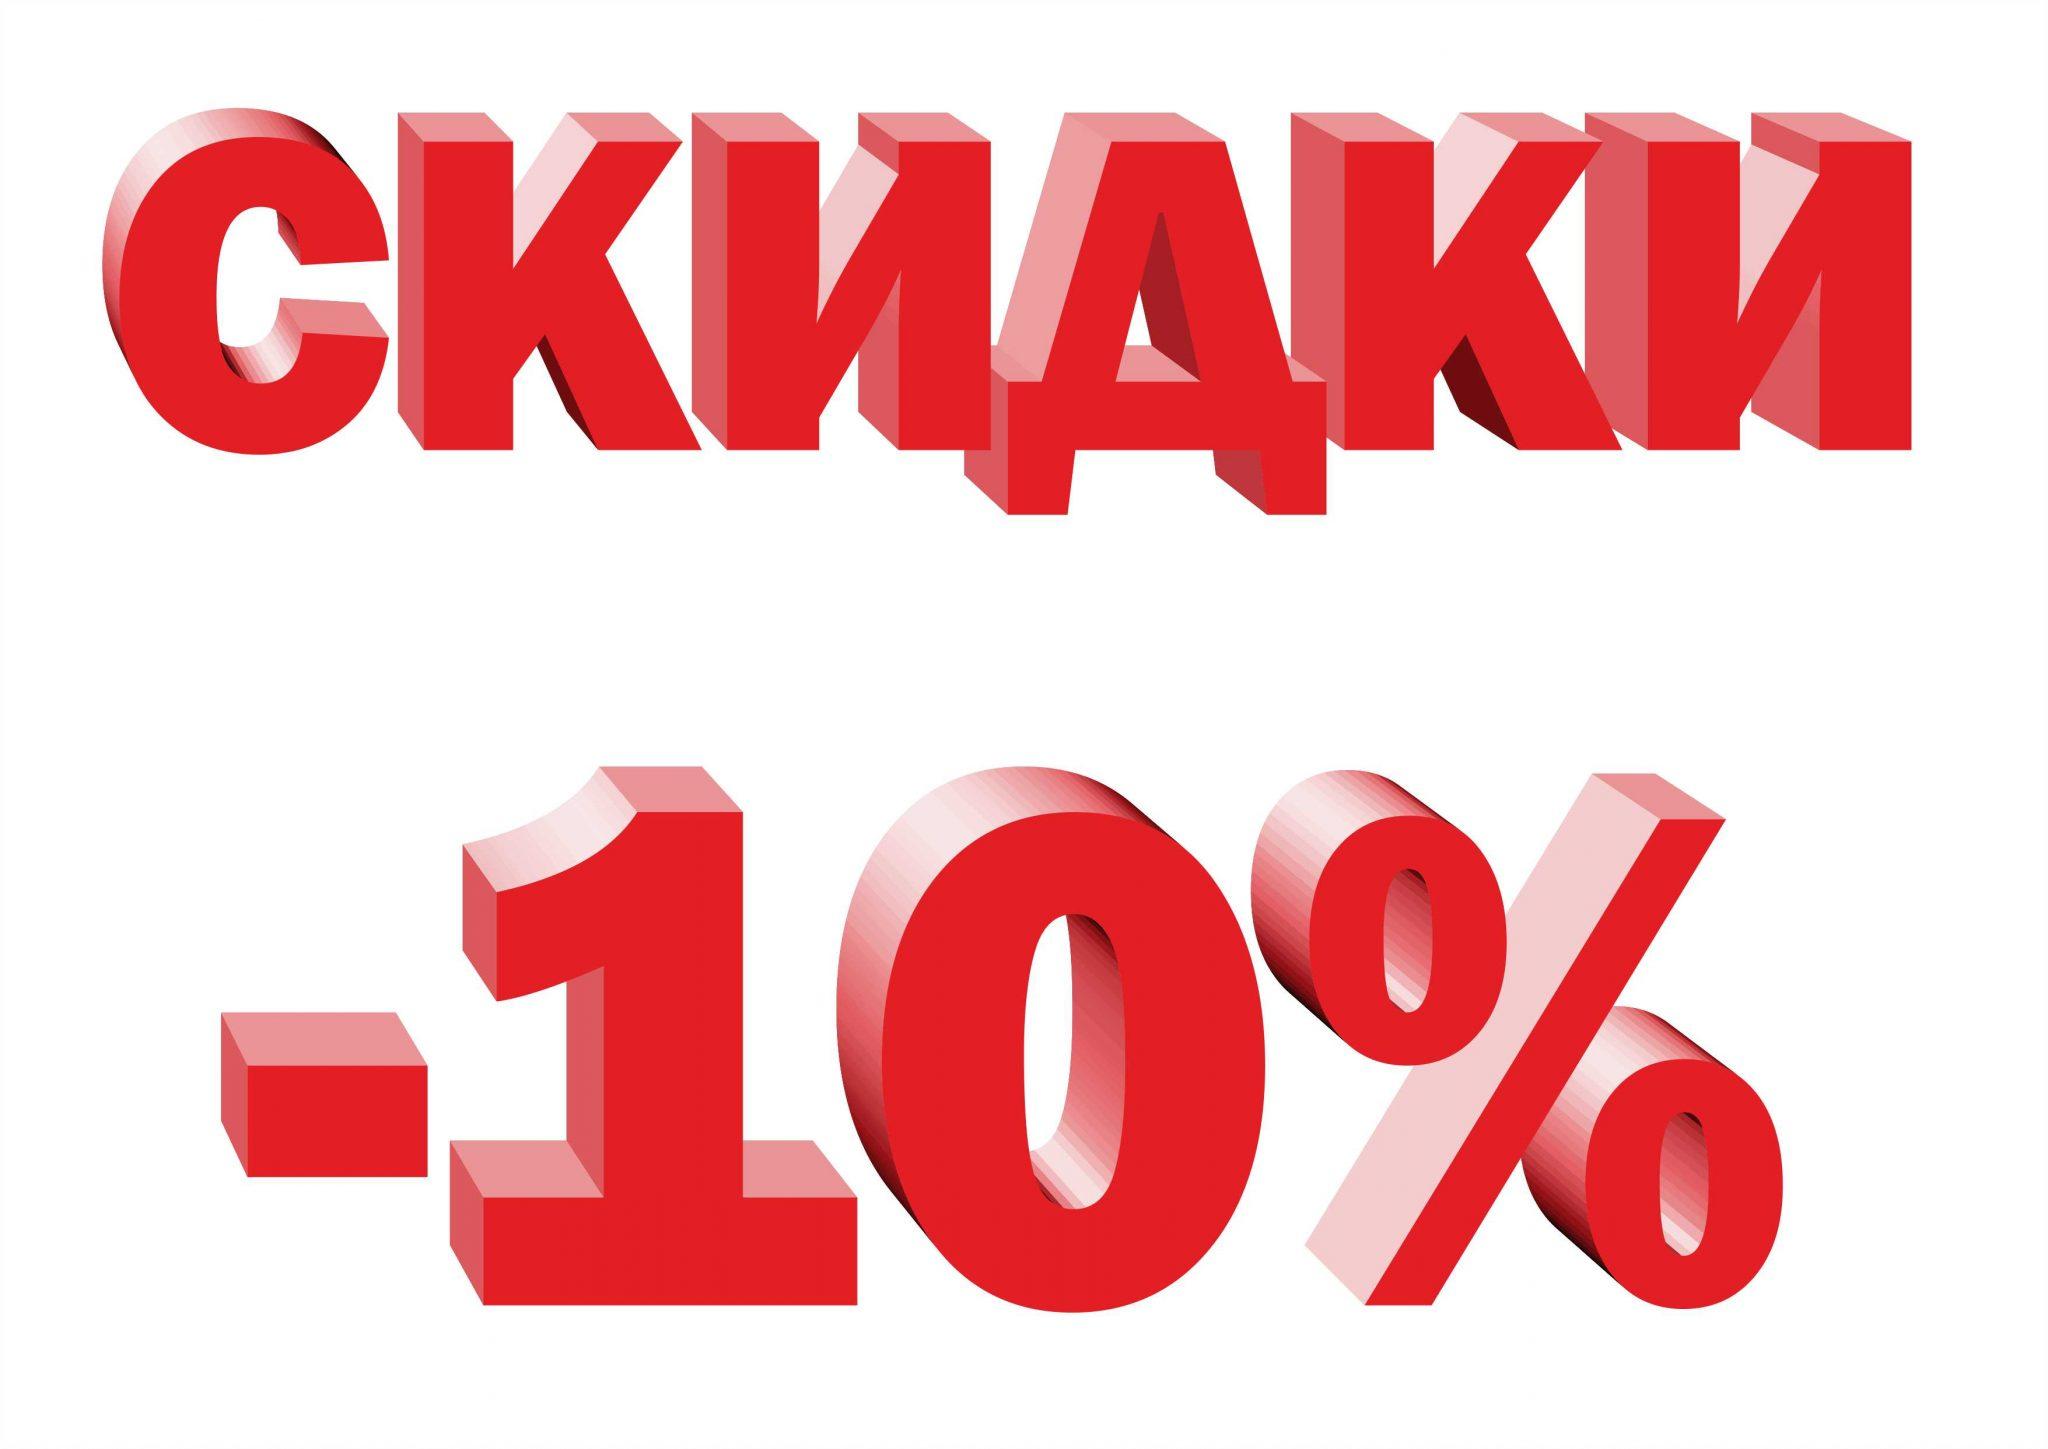 skidka-10-protsentov-a4.jpg